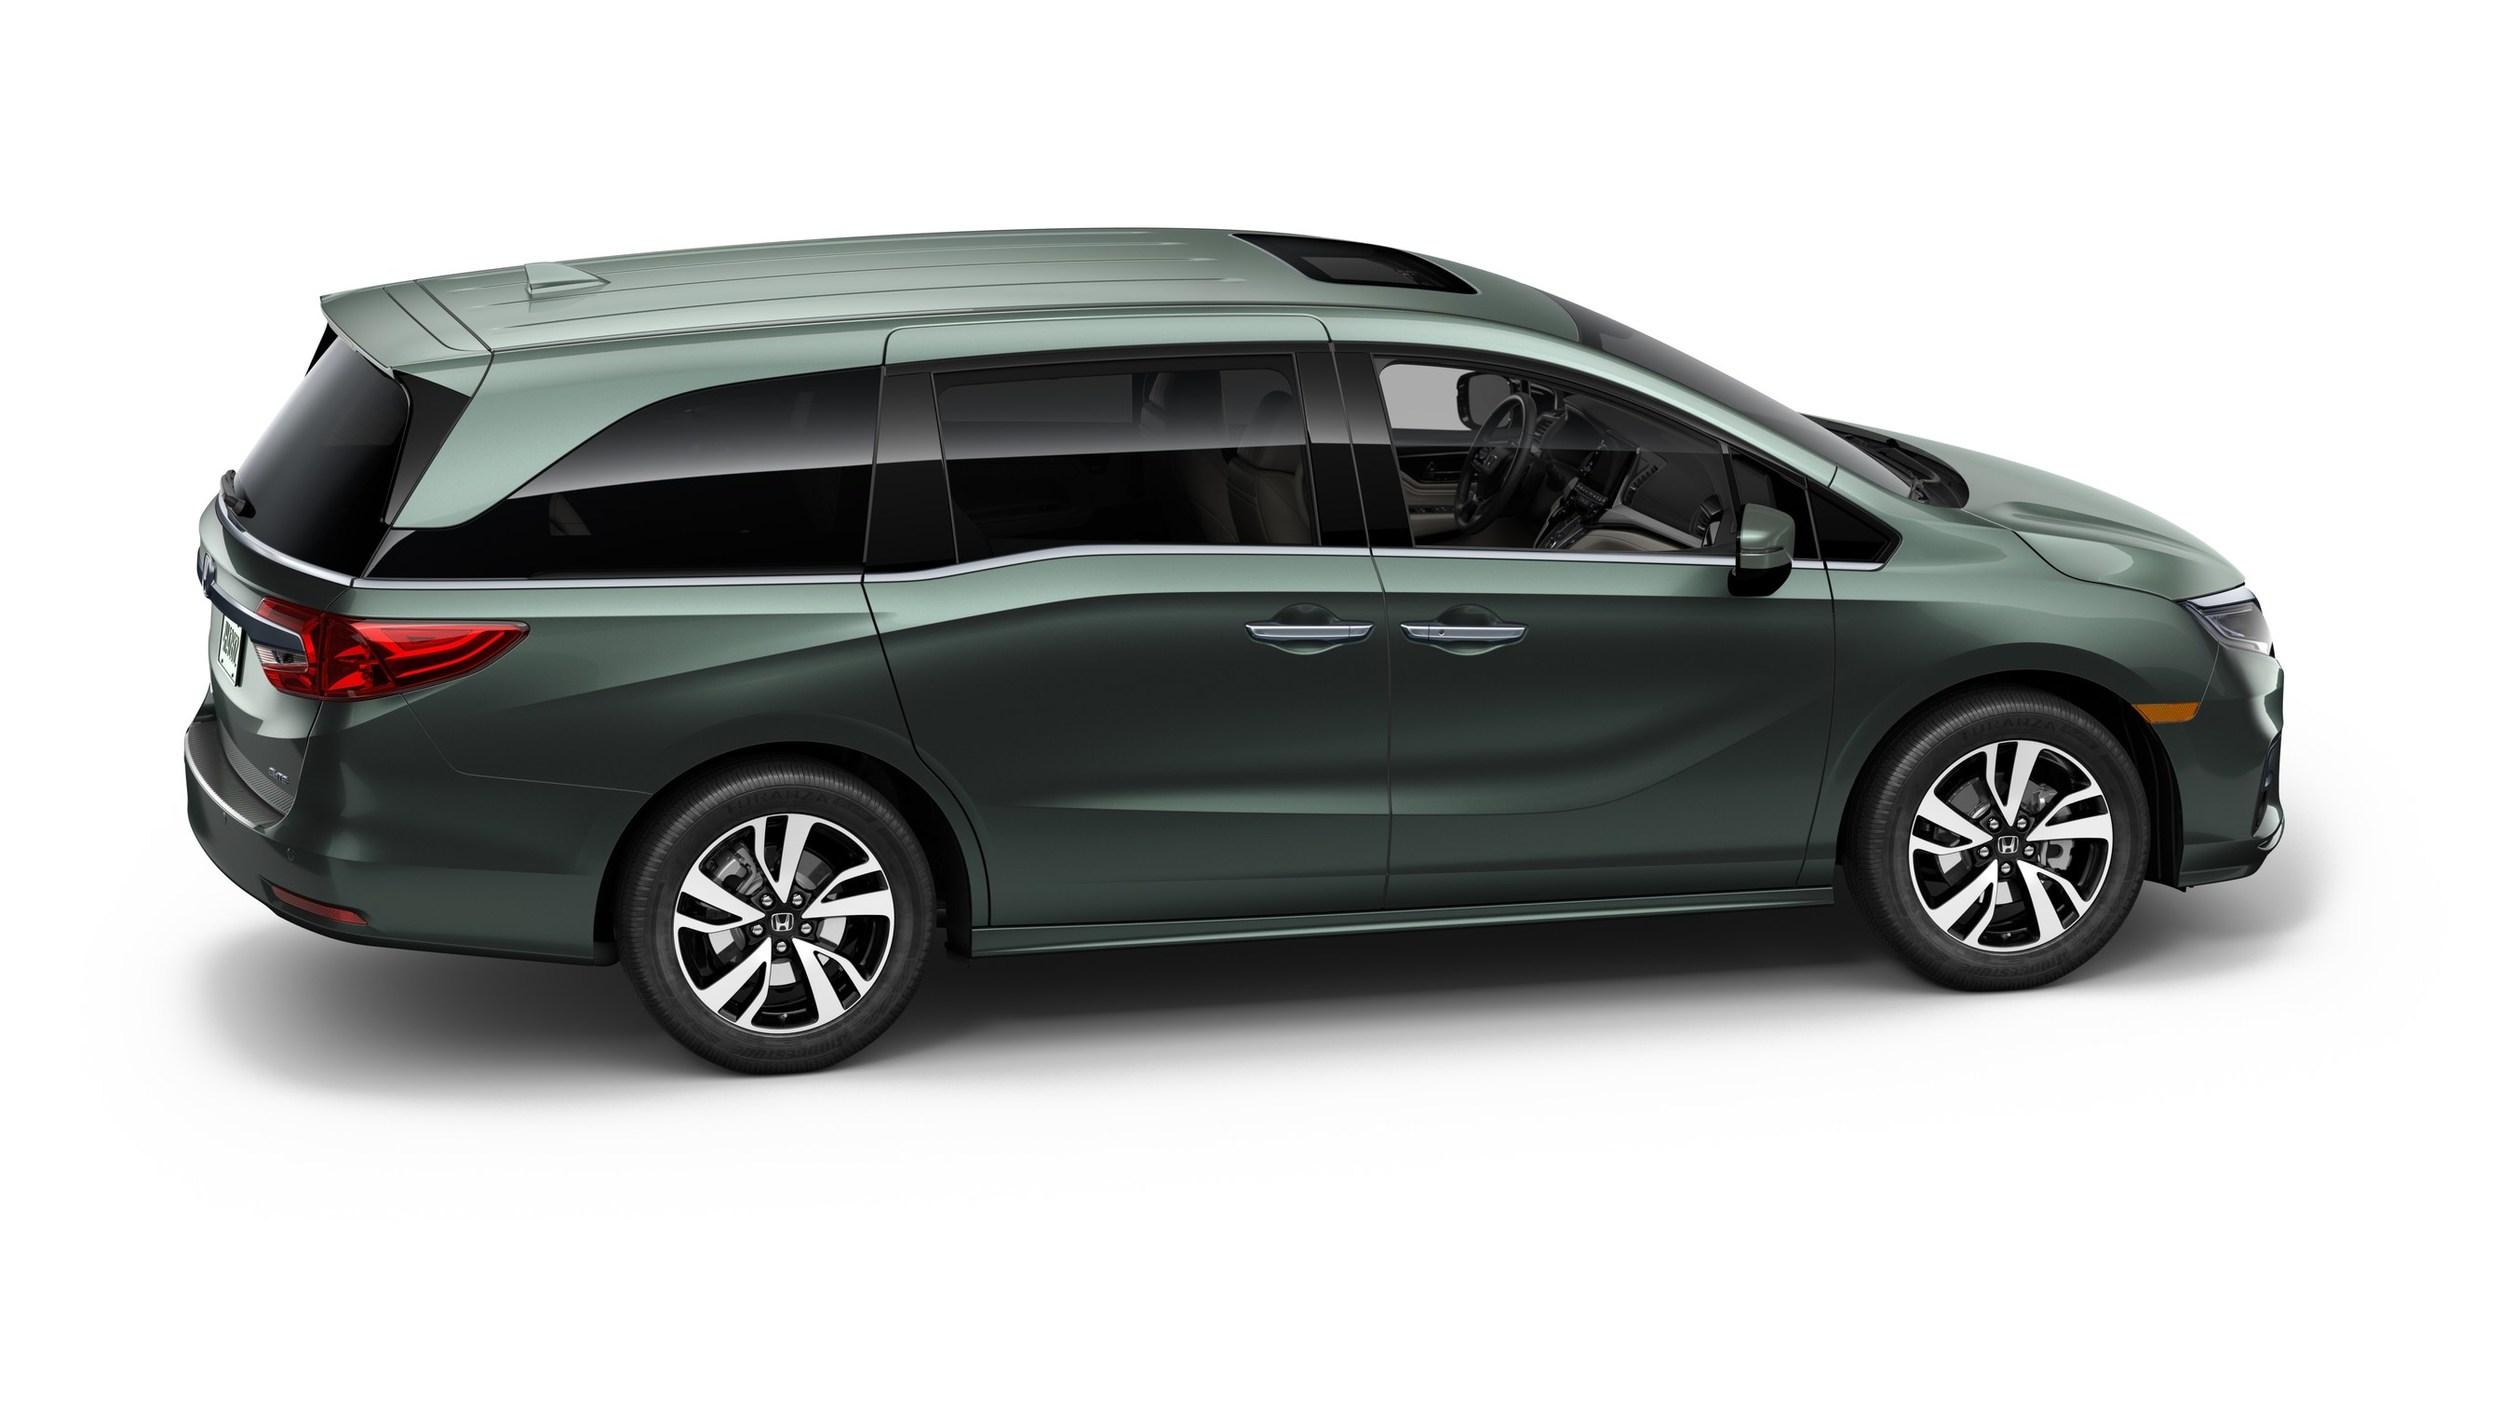 All new 2018 honda odyssey minivan makes world debut at 2017 naias takes family friendly design